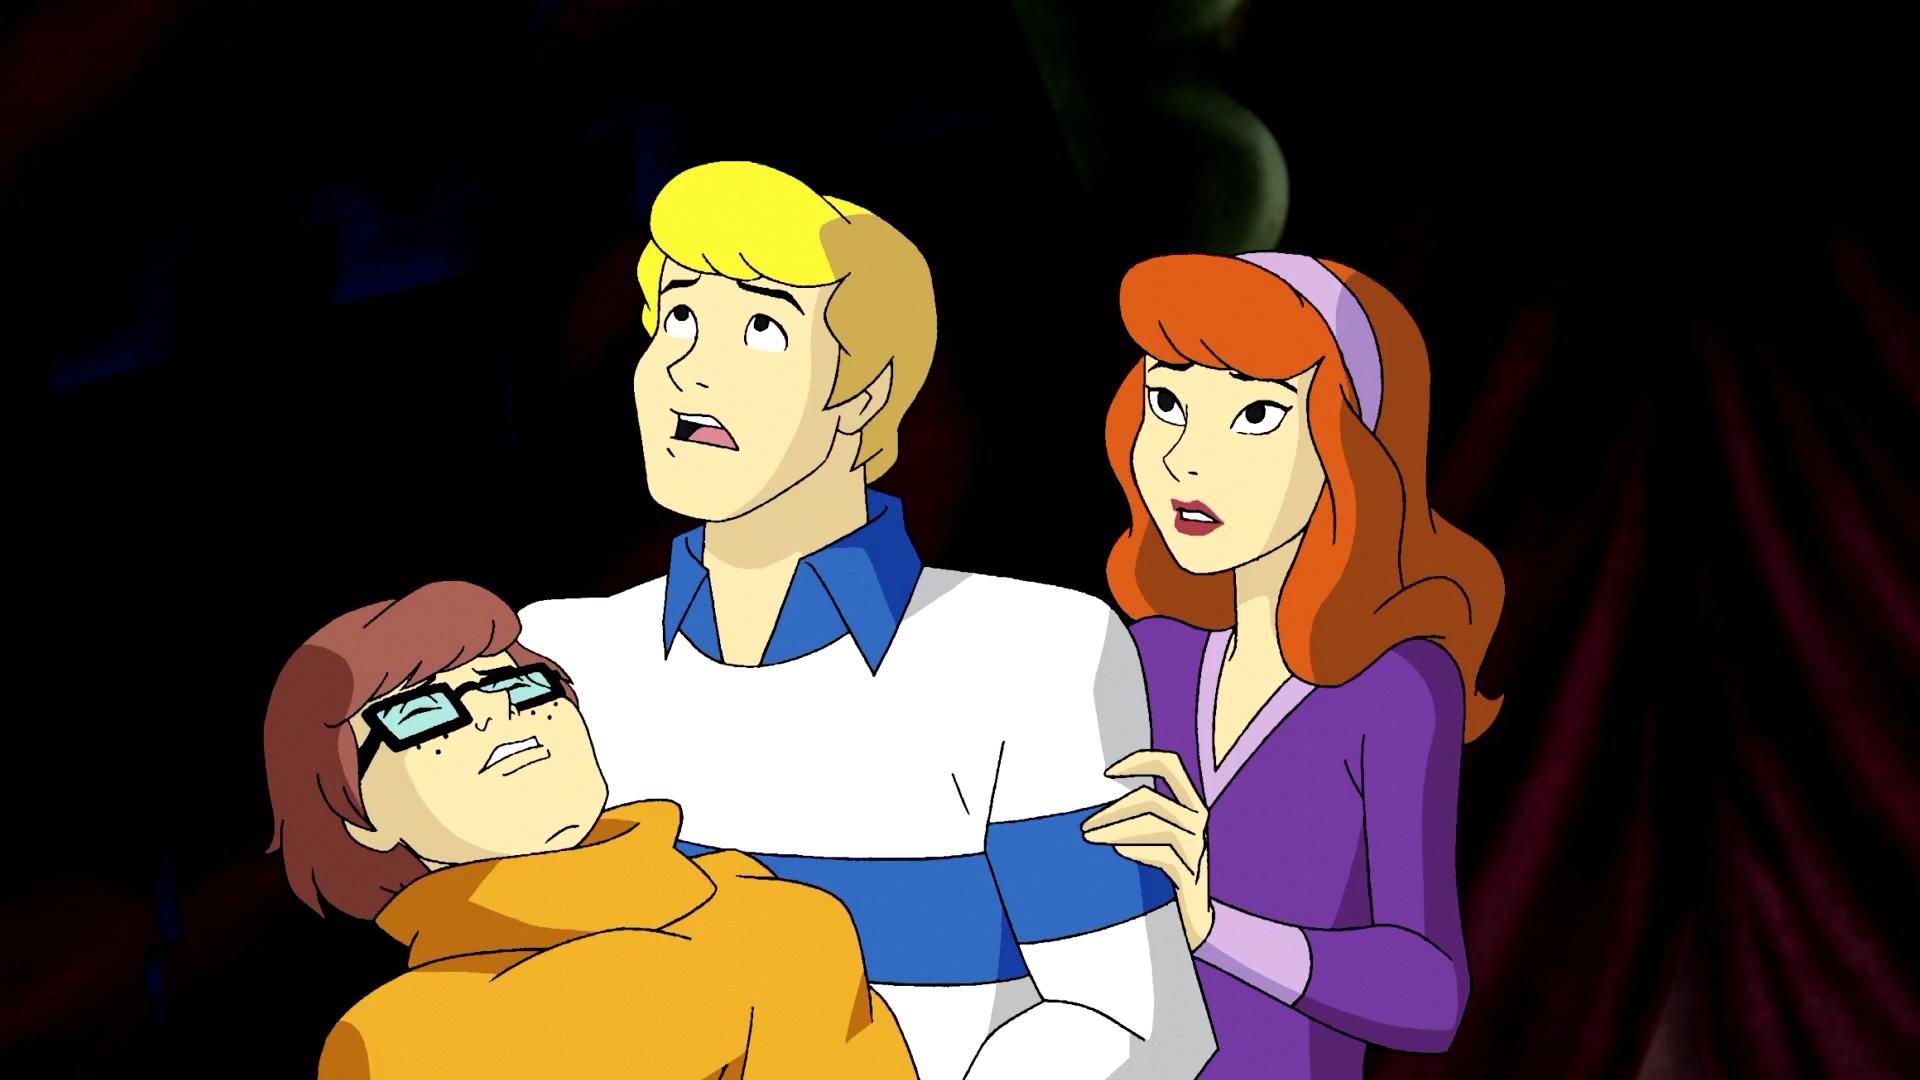 2008 Scooby-Doo! and the Goblin King WEB-DL 1080p [Dub Пифагор] [MVO Бест Кино] [ENG] {RUS} {ENG} (CHP-n).mkv_20210317_141015.792.png